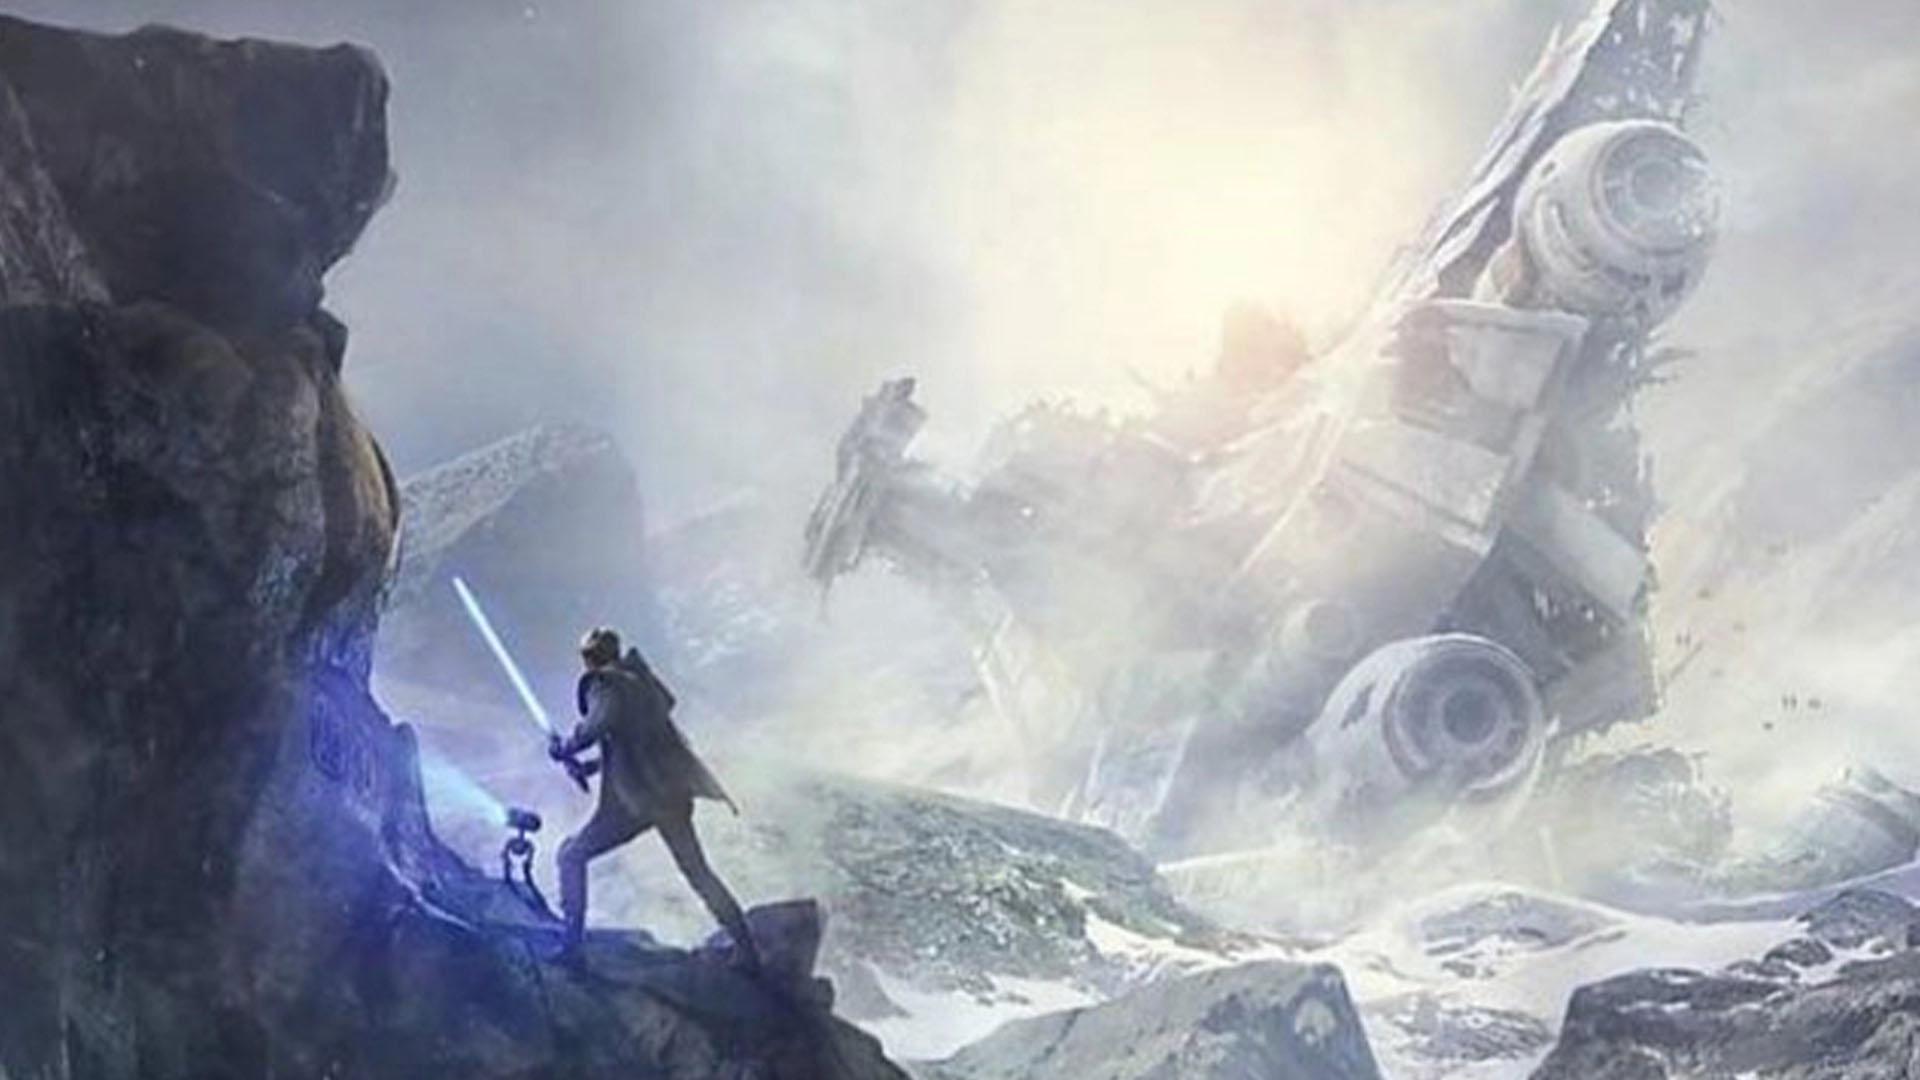 Star Wars: Jedi Fallen Order will not be Dark Souls with lightsabers